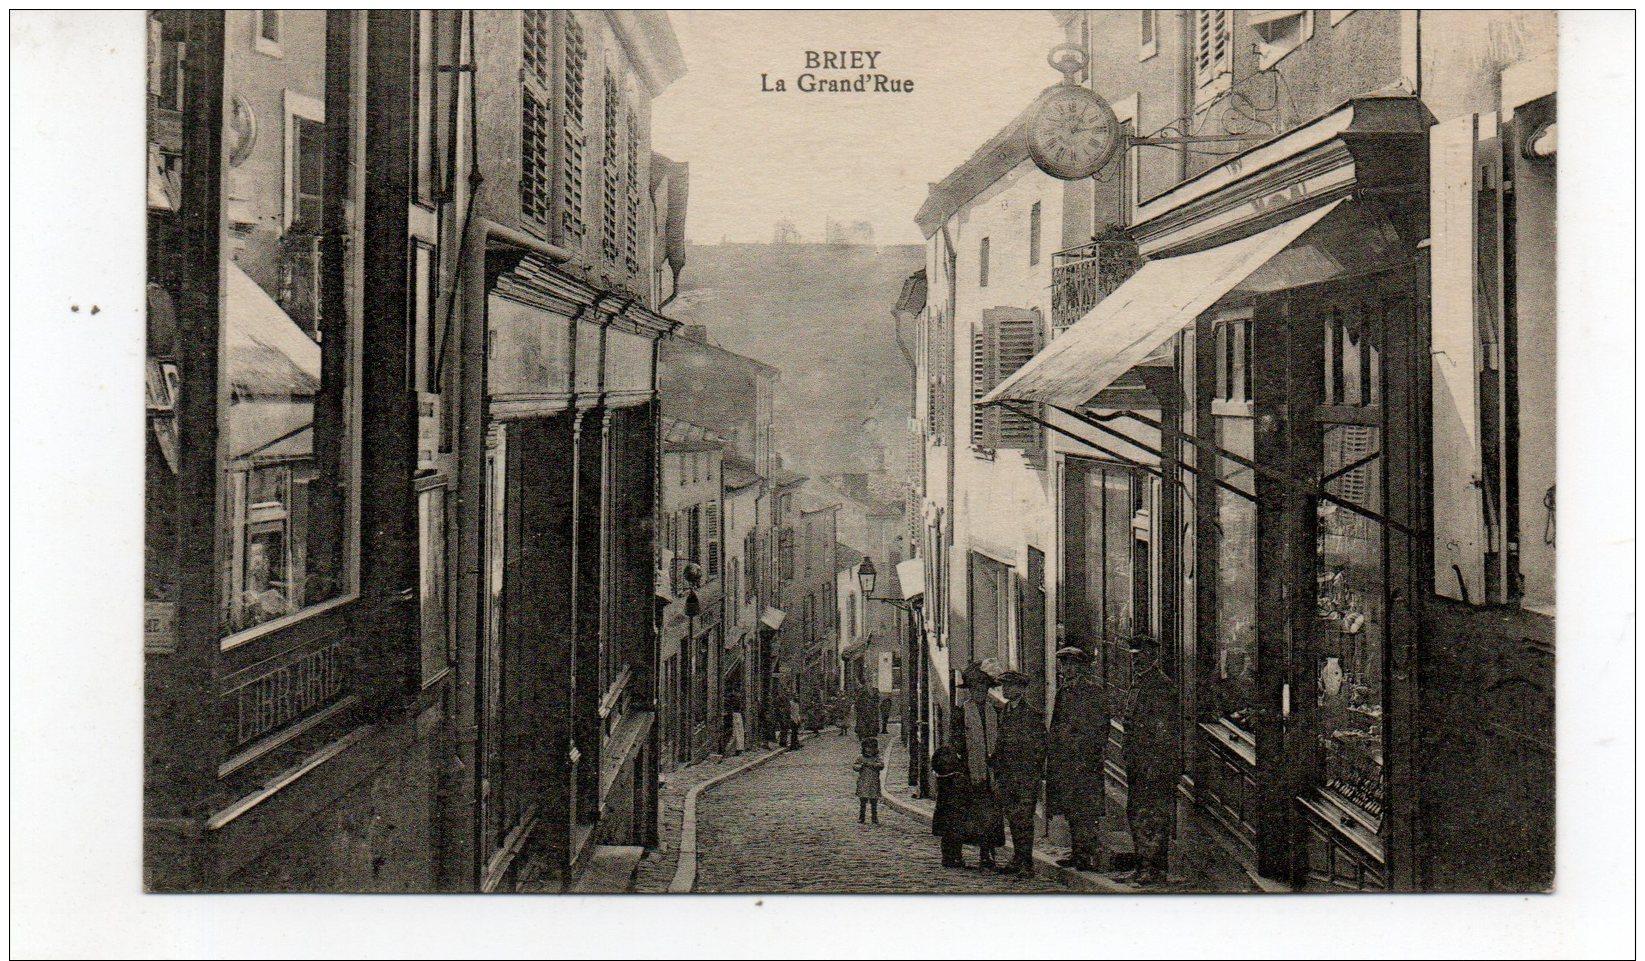 BRIEY  La Grand Rue  Librairie - Briey